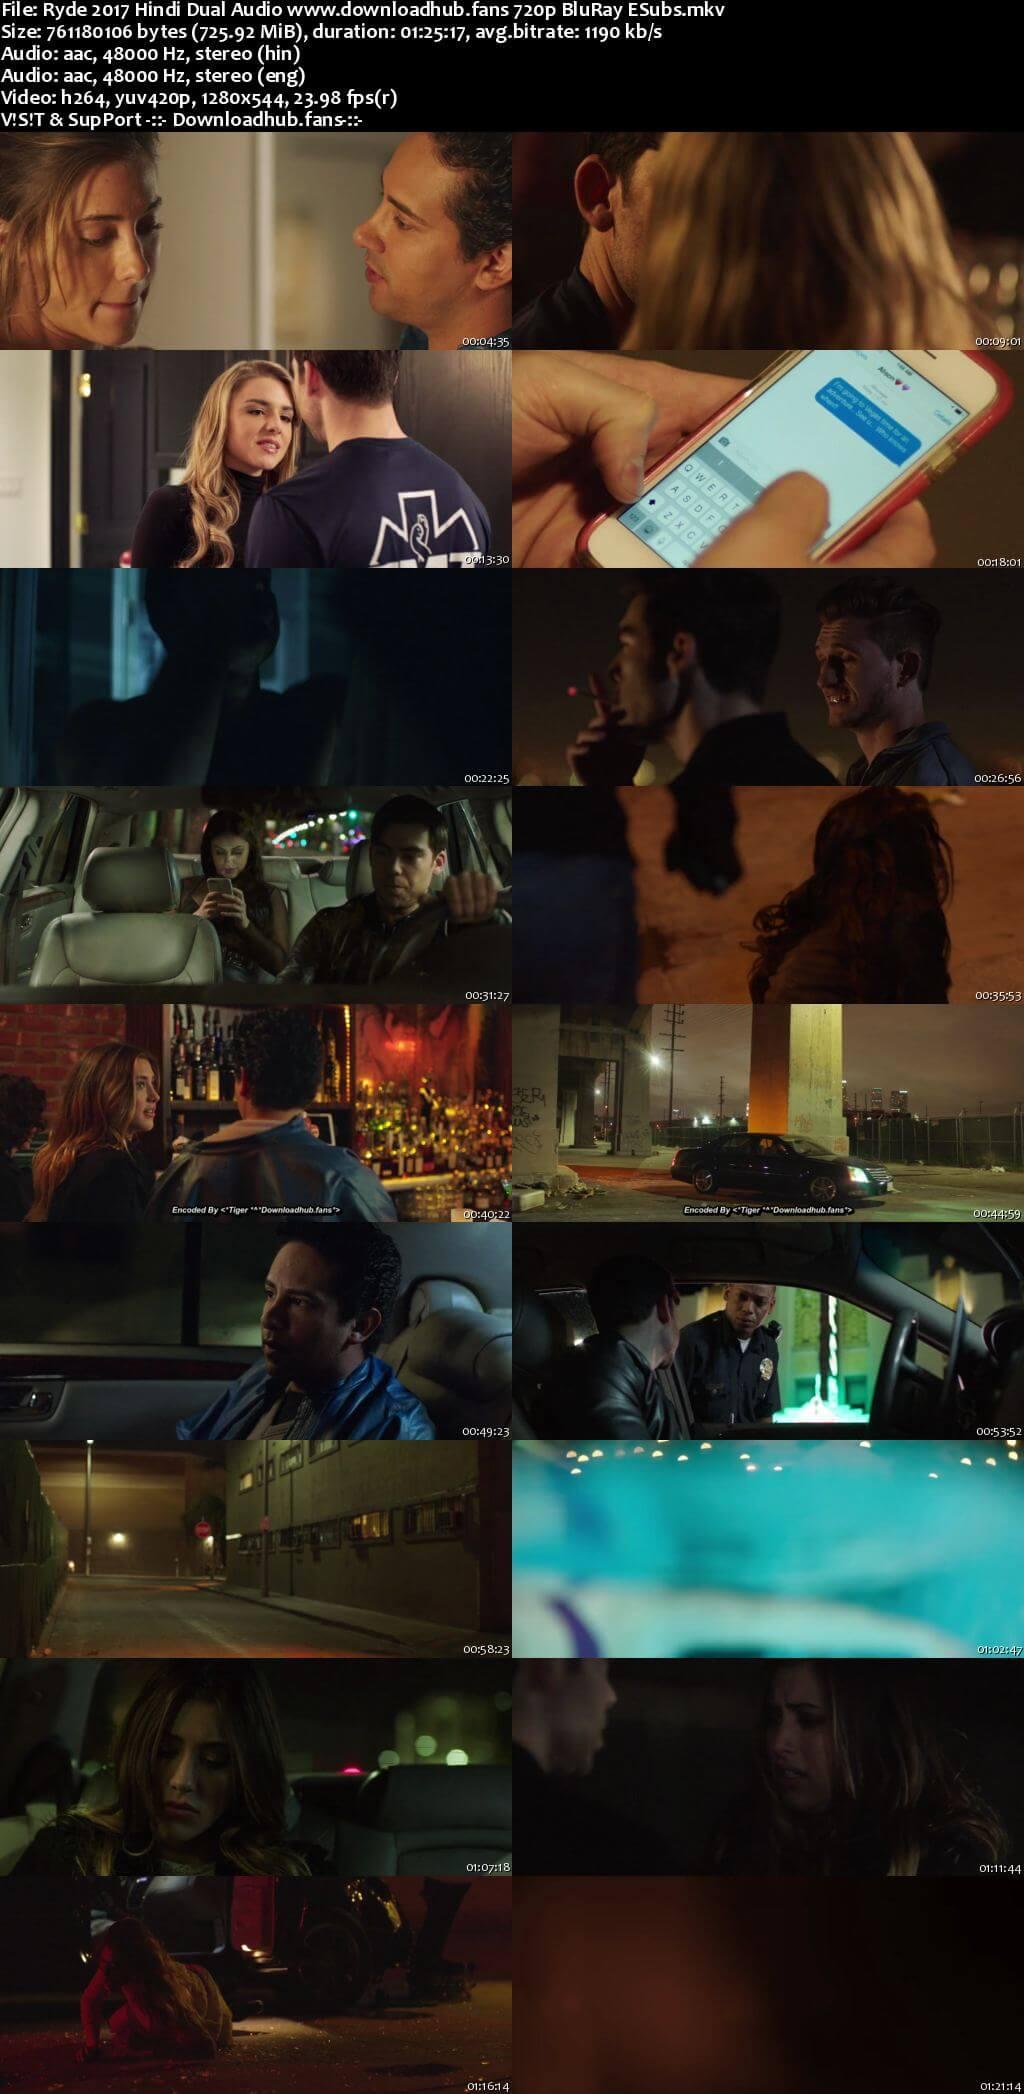 Ryde 2017 Hindi Dual Audio 720p BluRay ESubs